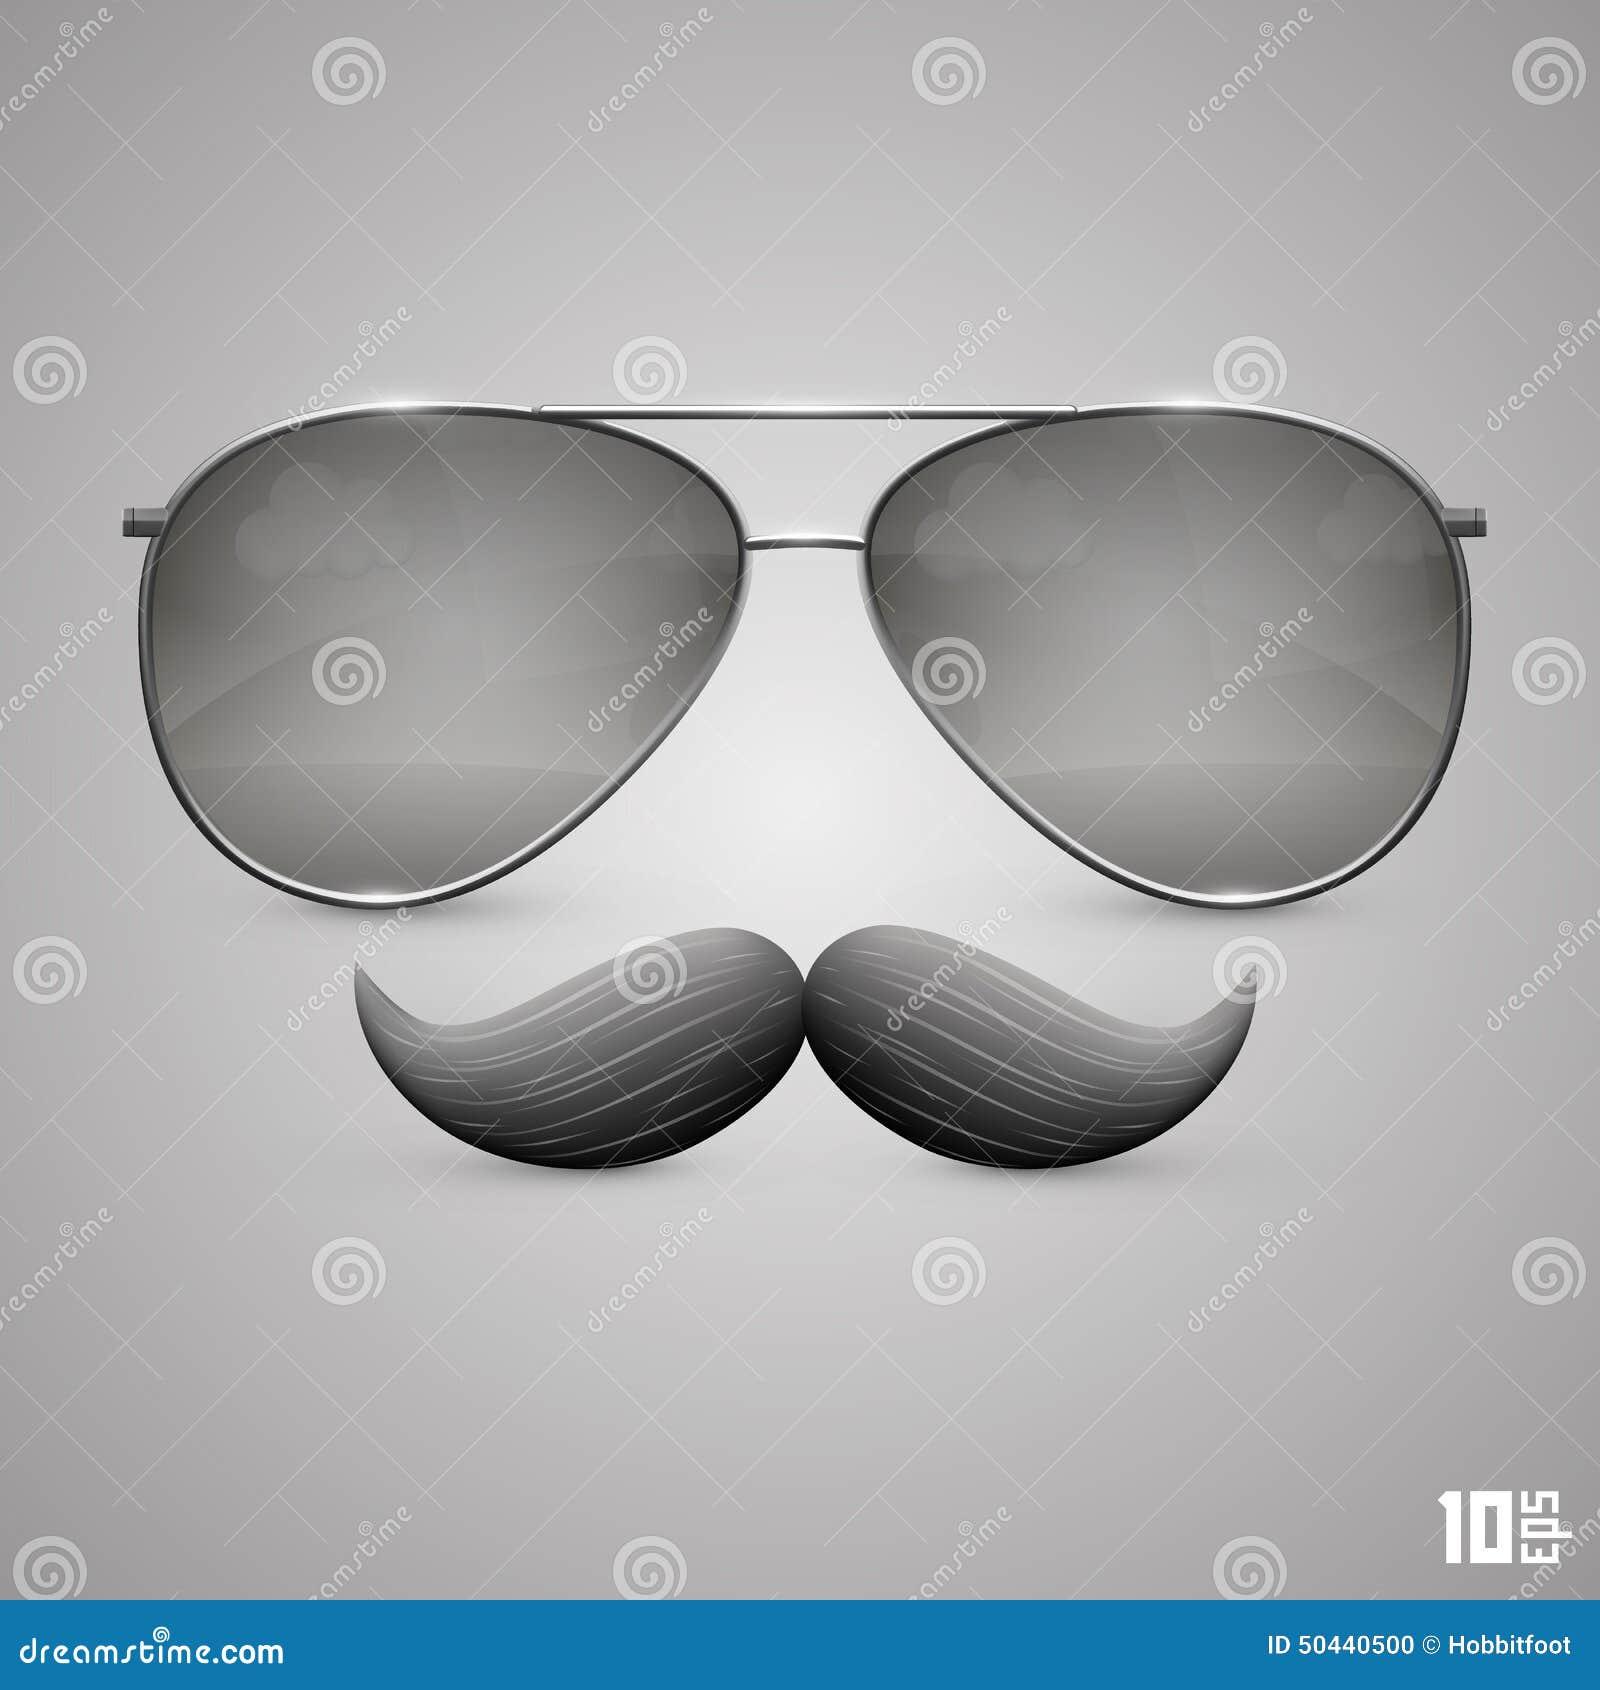 1221d0c5679c Fake Glasses Mustache Stock Illustrations – 354 Fake Glasses Mustache Stock  Illustrations